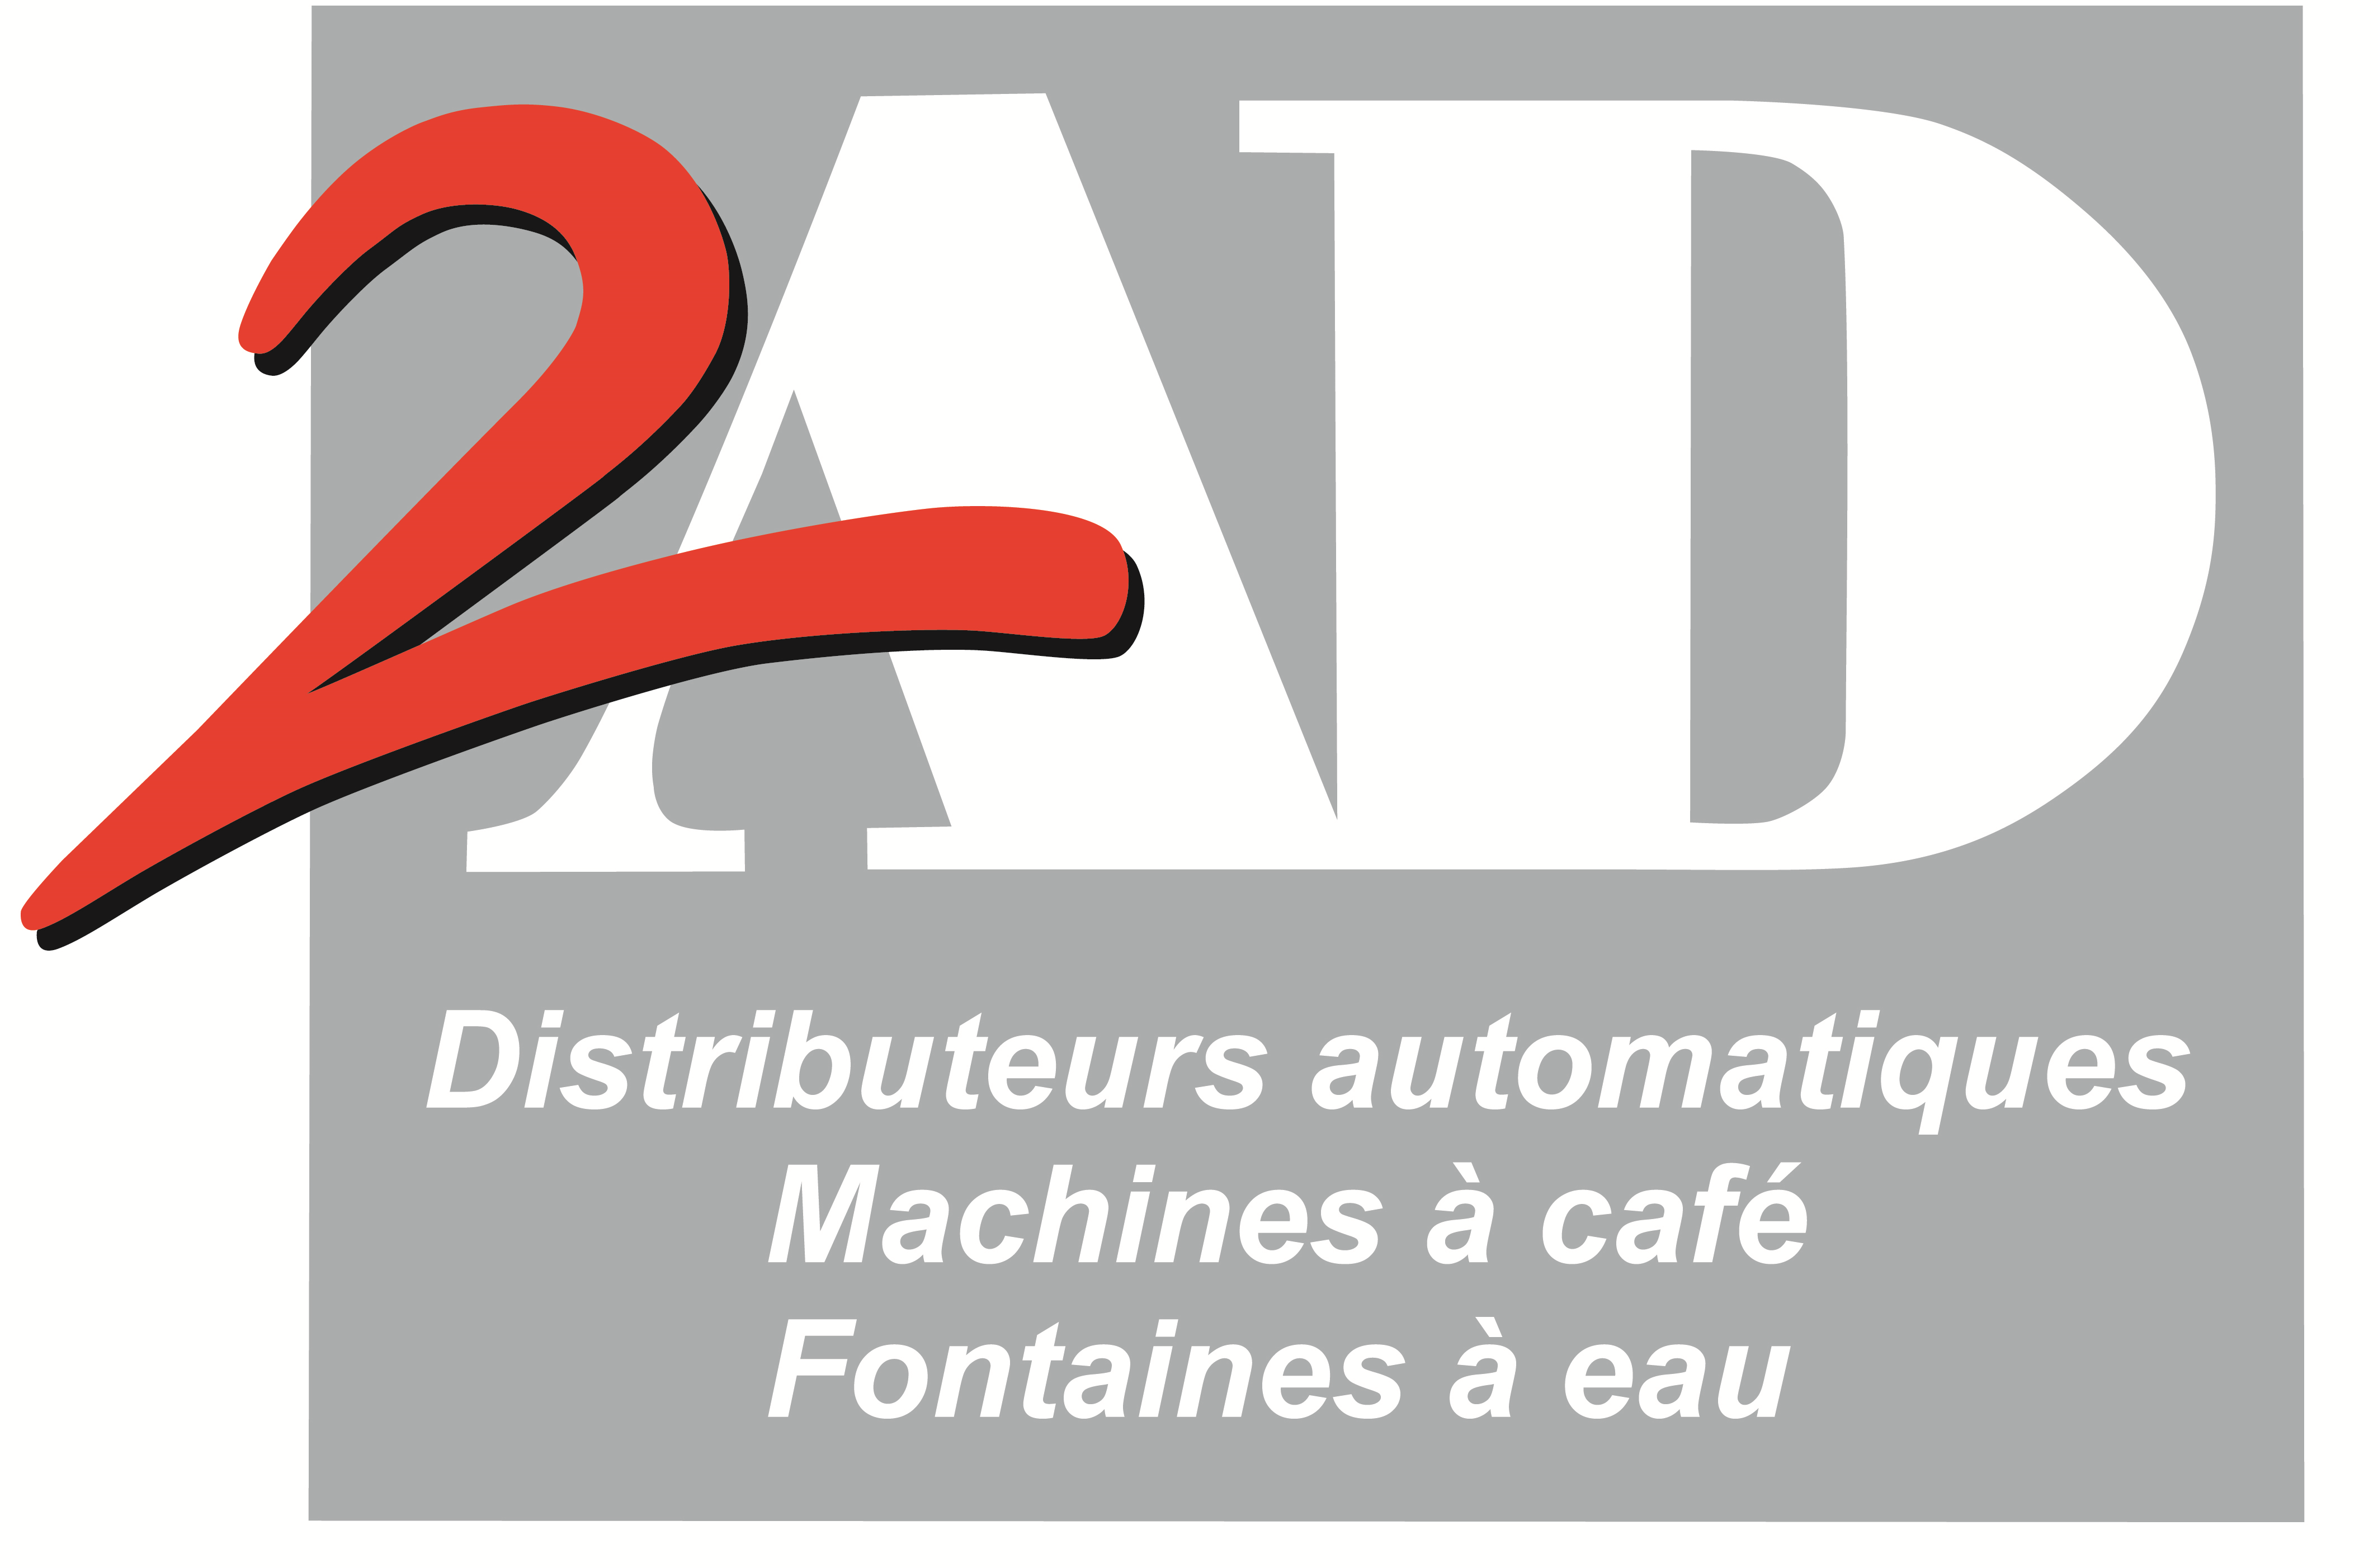 logo-2ad